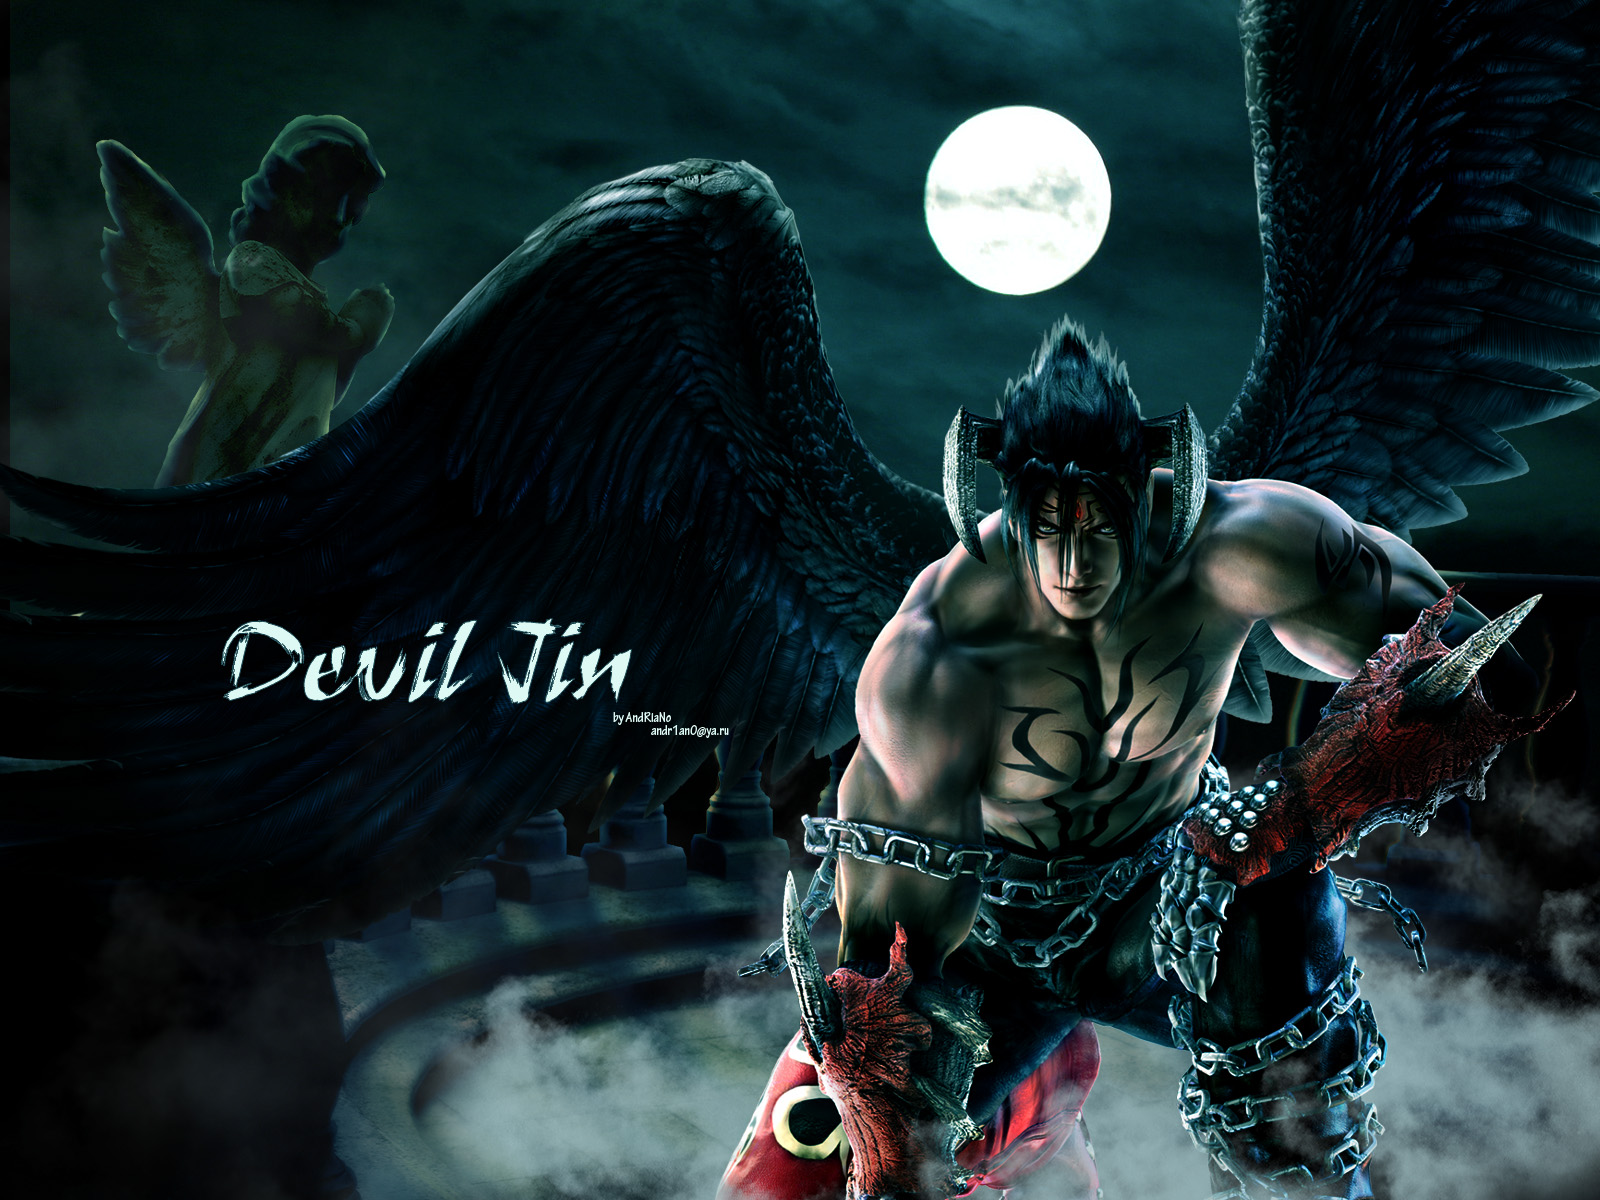 http://1.bp.blogspot.com/_fJt8fjIlJCk/S5niHrOP2dI/AAAAAAAAADo/HVu49_duhe4/S1600-R/devils+jin.jpg